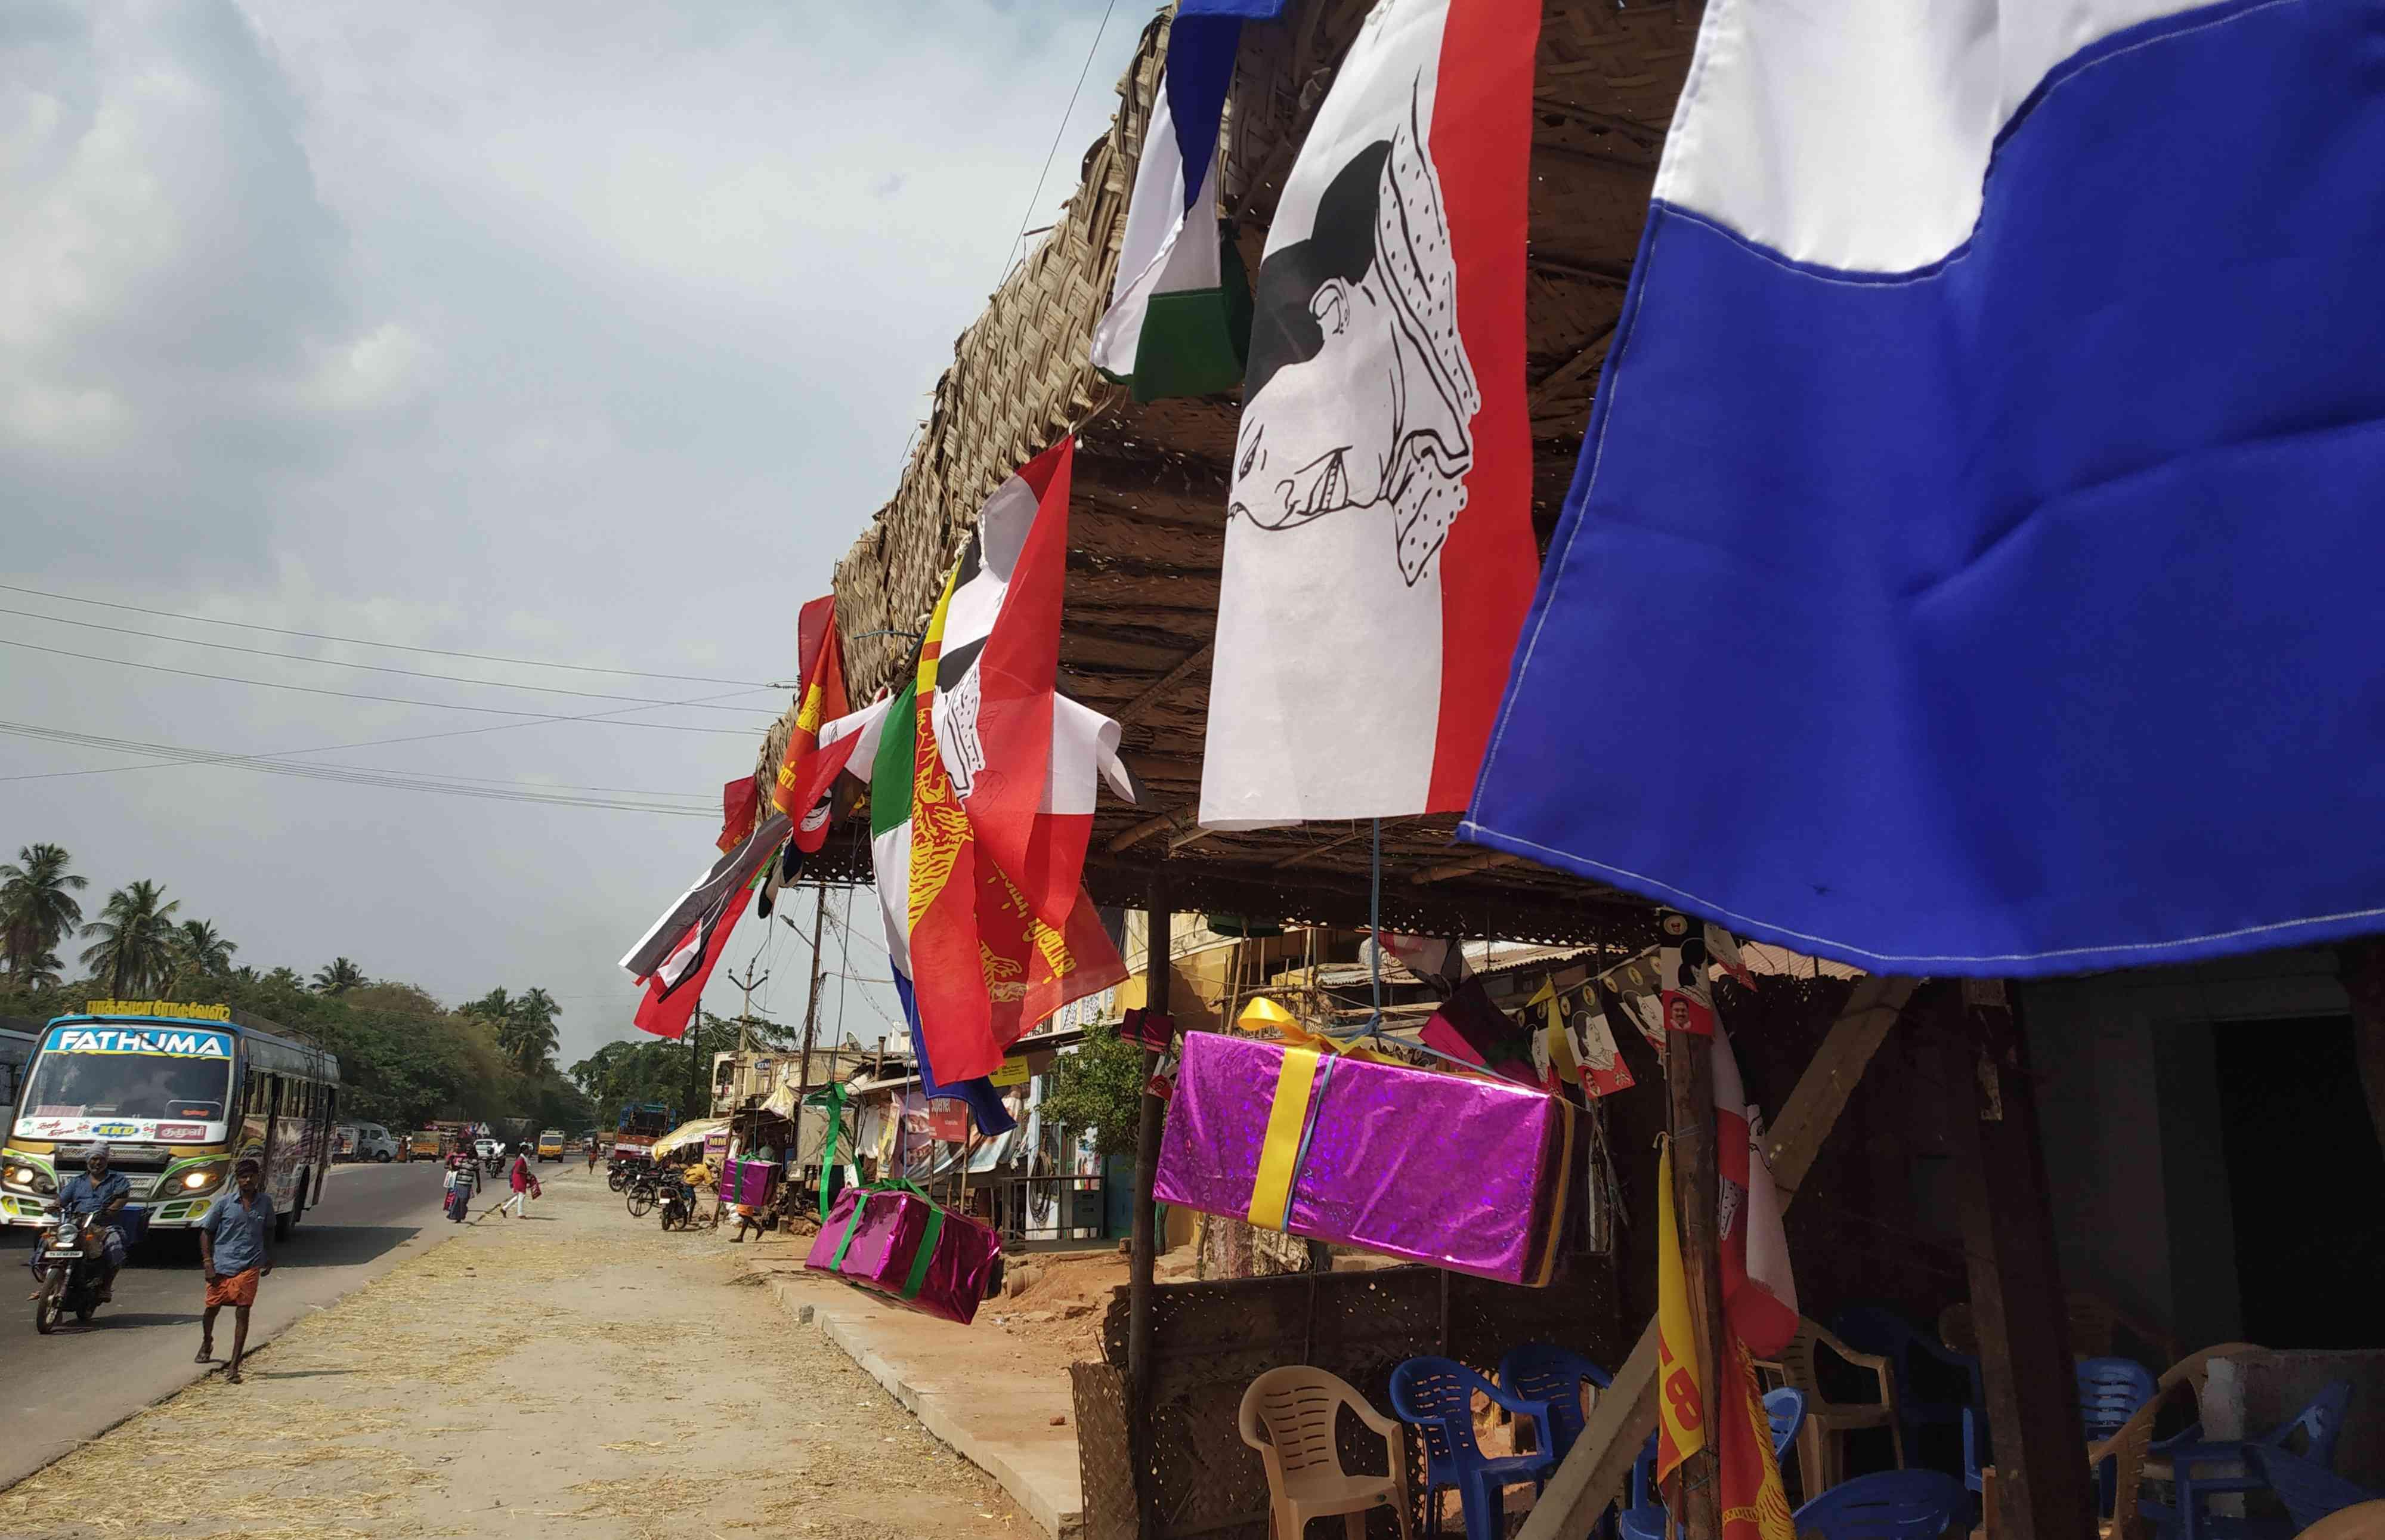 Amma Makkal Munnetra Kazhagam's election office near Cumbum. Photo credit: Sruthisagar Yamunan